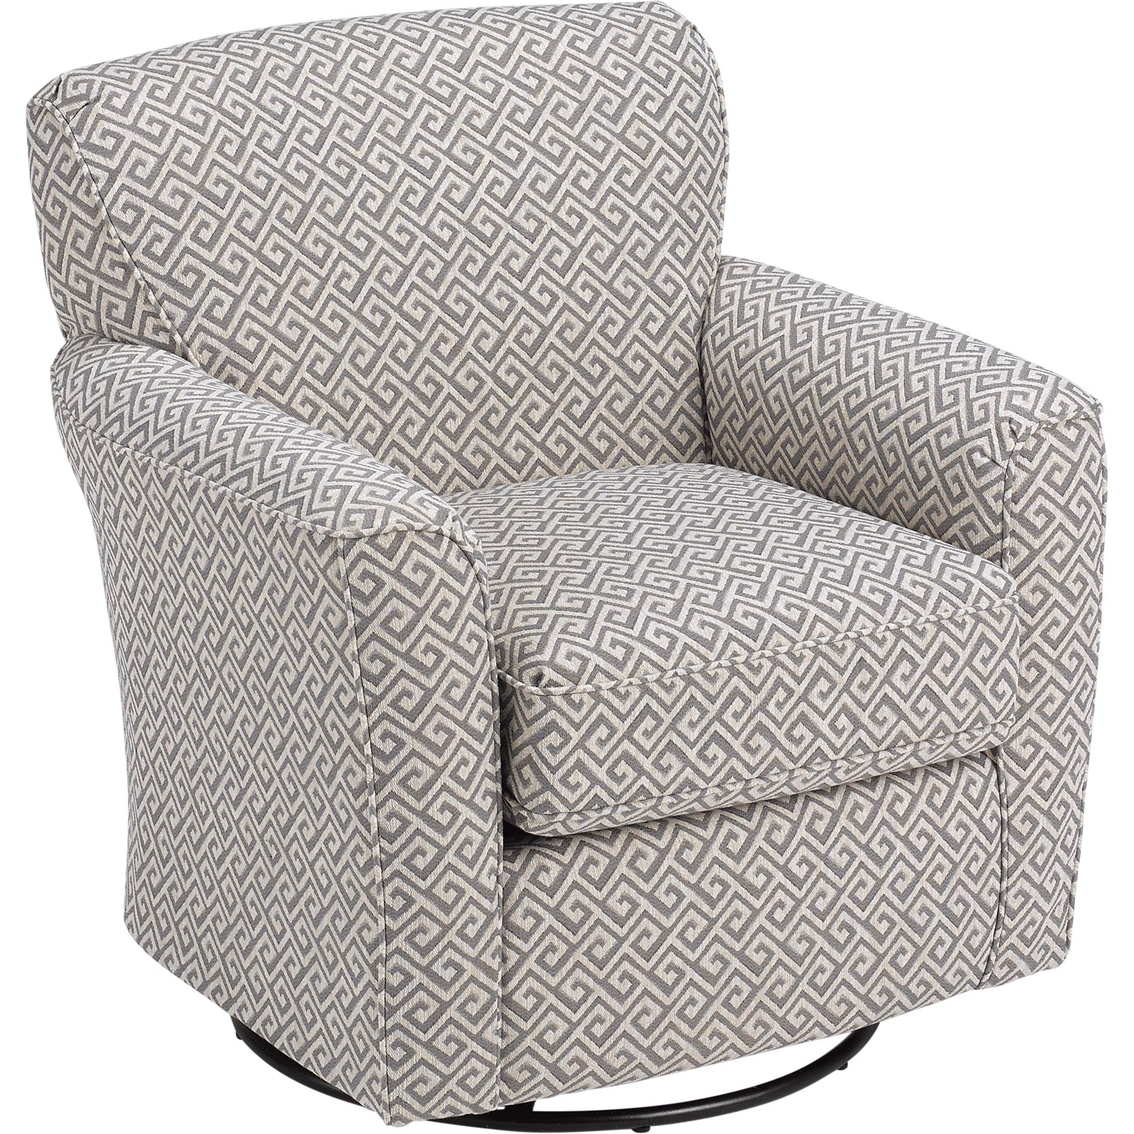 Best Home Furnishings Kaylee Swivel Glider Chairs